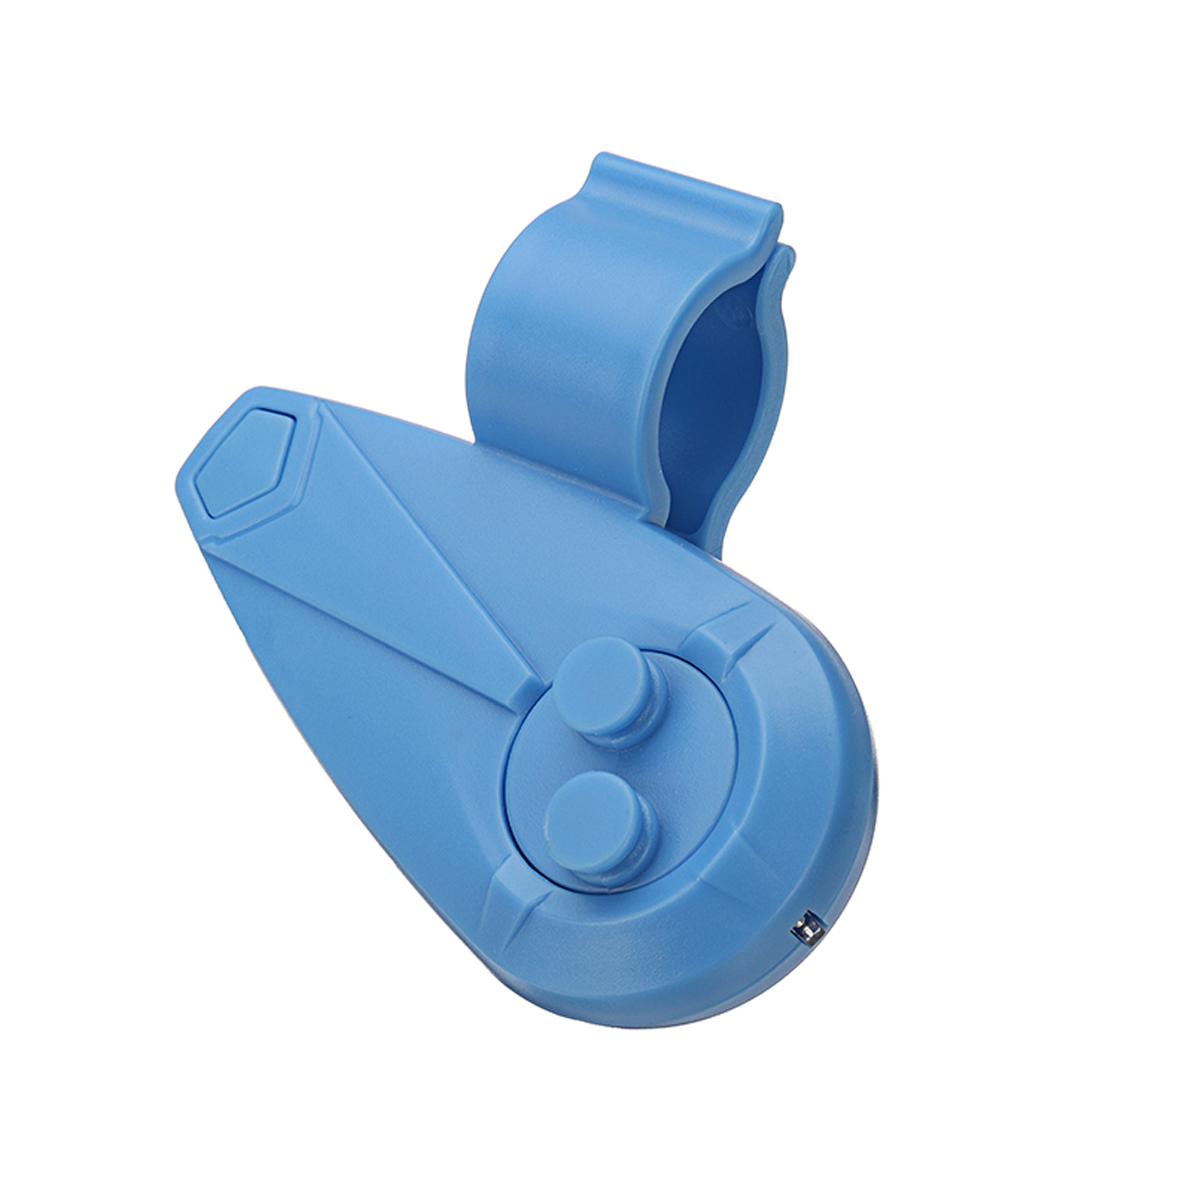 BluetoothЭлектронныйСветодиодныйРыбалкаБудильникBite Sound Alarm Bell ABS Rob Clip Reminder - фото 7